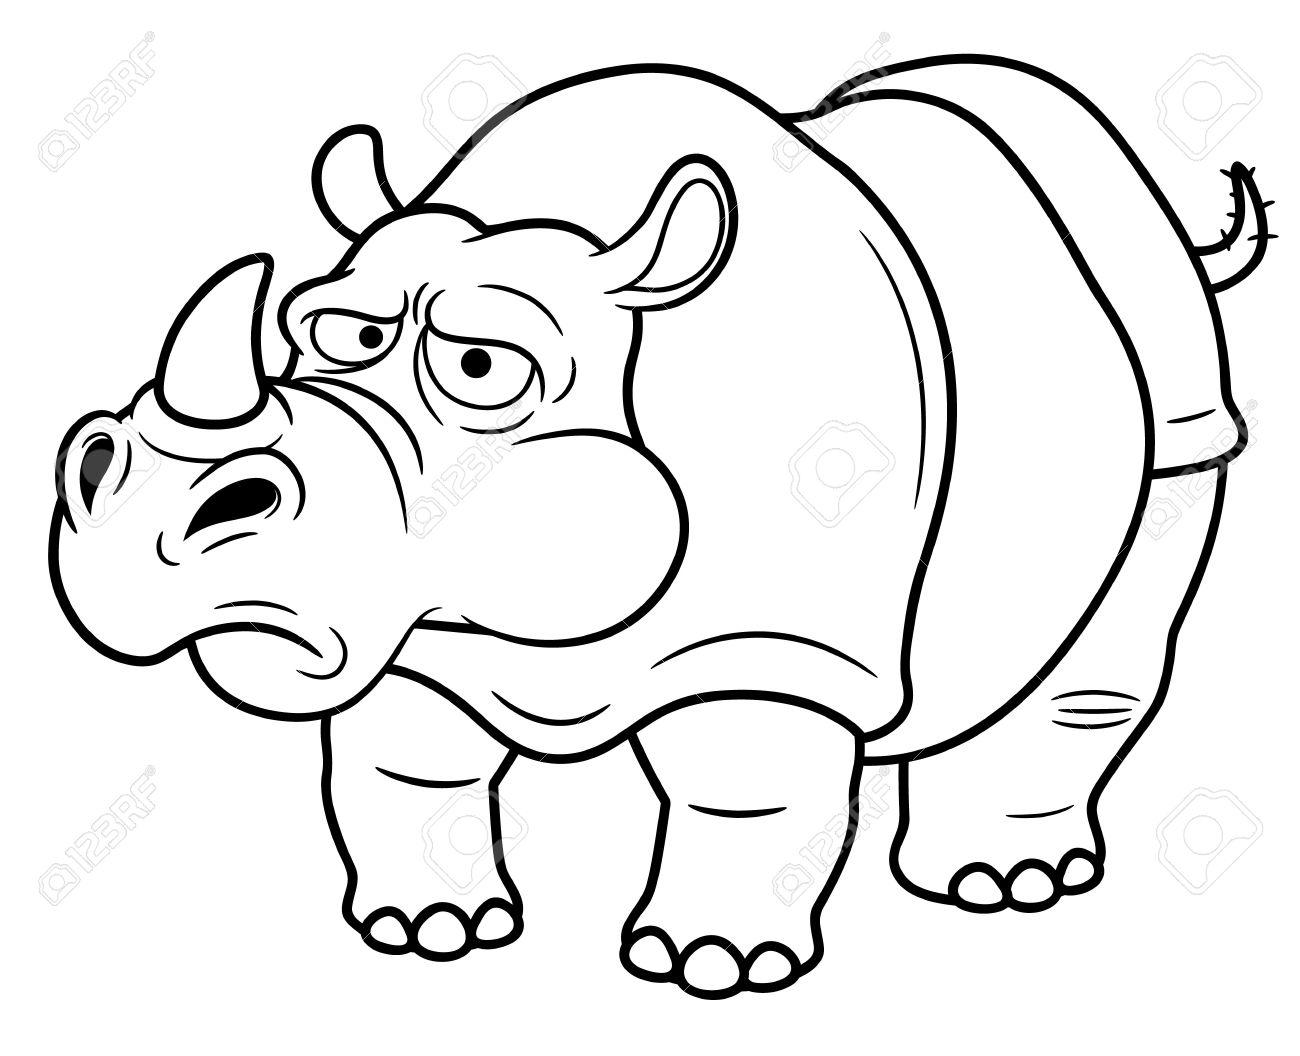 illustration of cartoon rhino coloring book royalty free